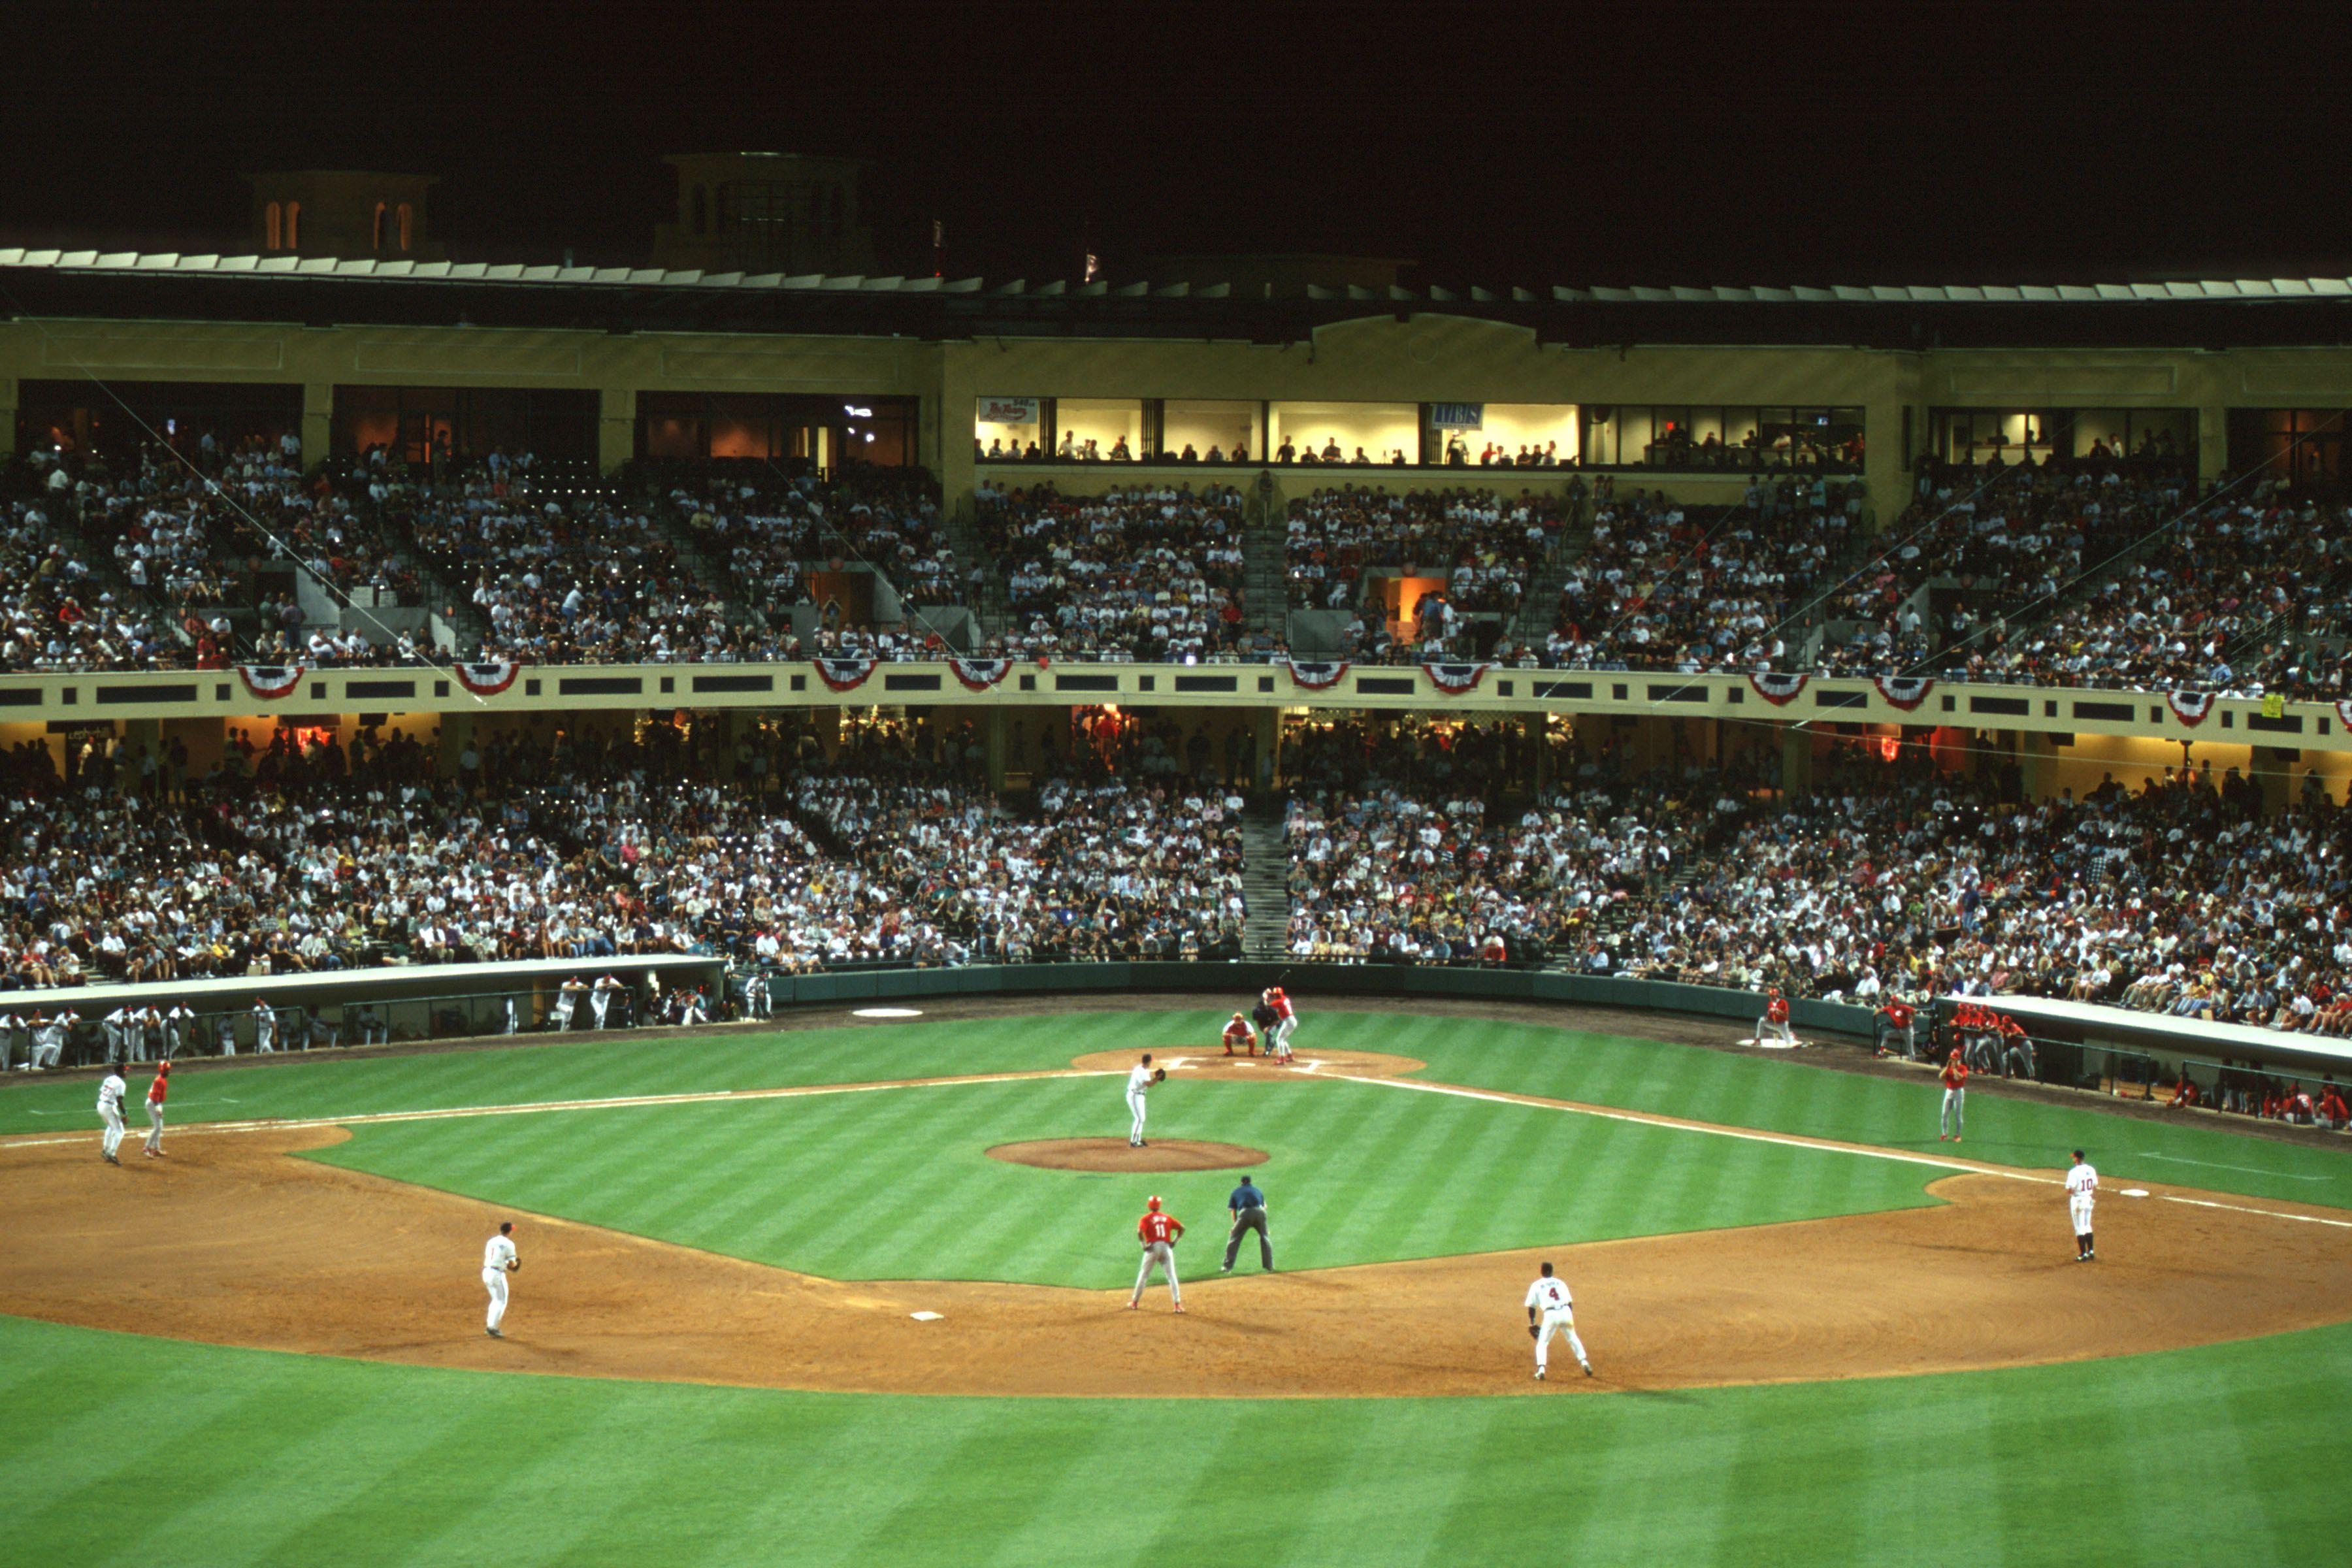 Walt Disney World Espn Wide World Of Sports Complex Baseball Sports Complex World Of Sports Walt Disney World